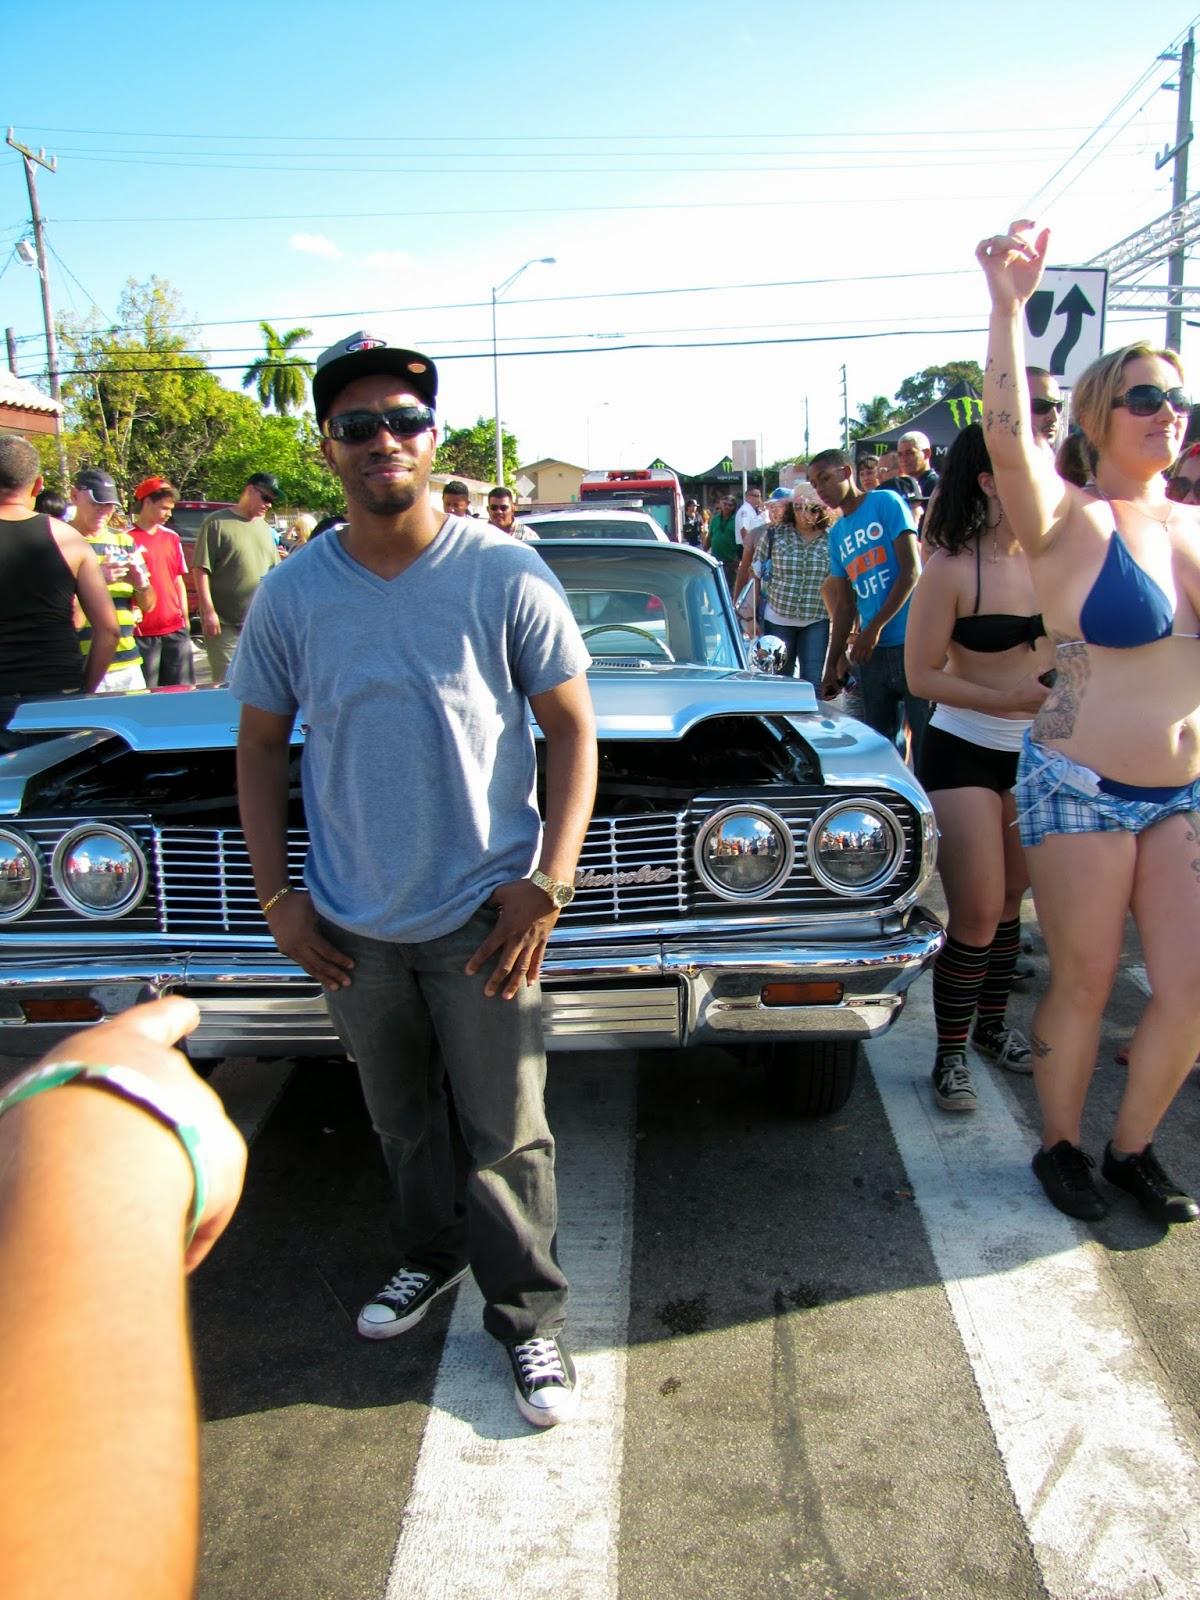 Calle Ocho 2014 Miami Florida Little Havana K-OTIC pictures image